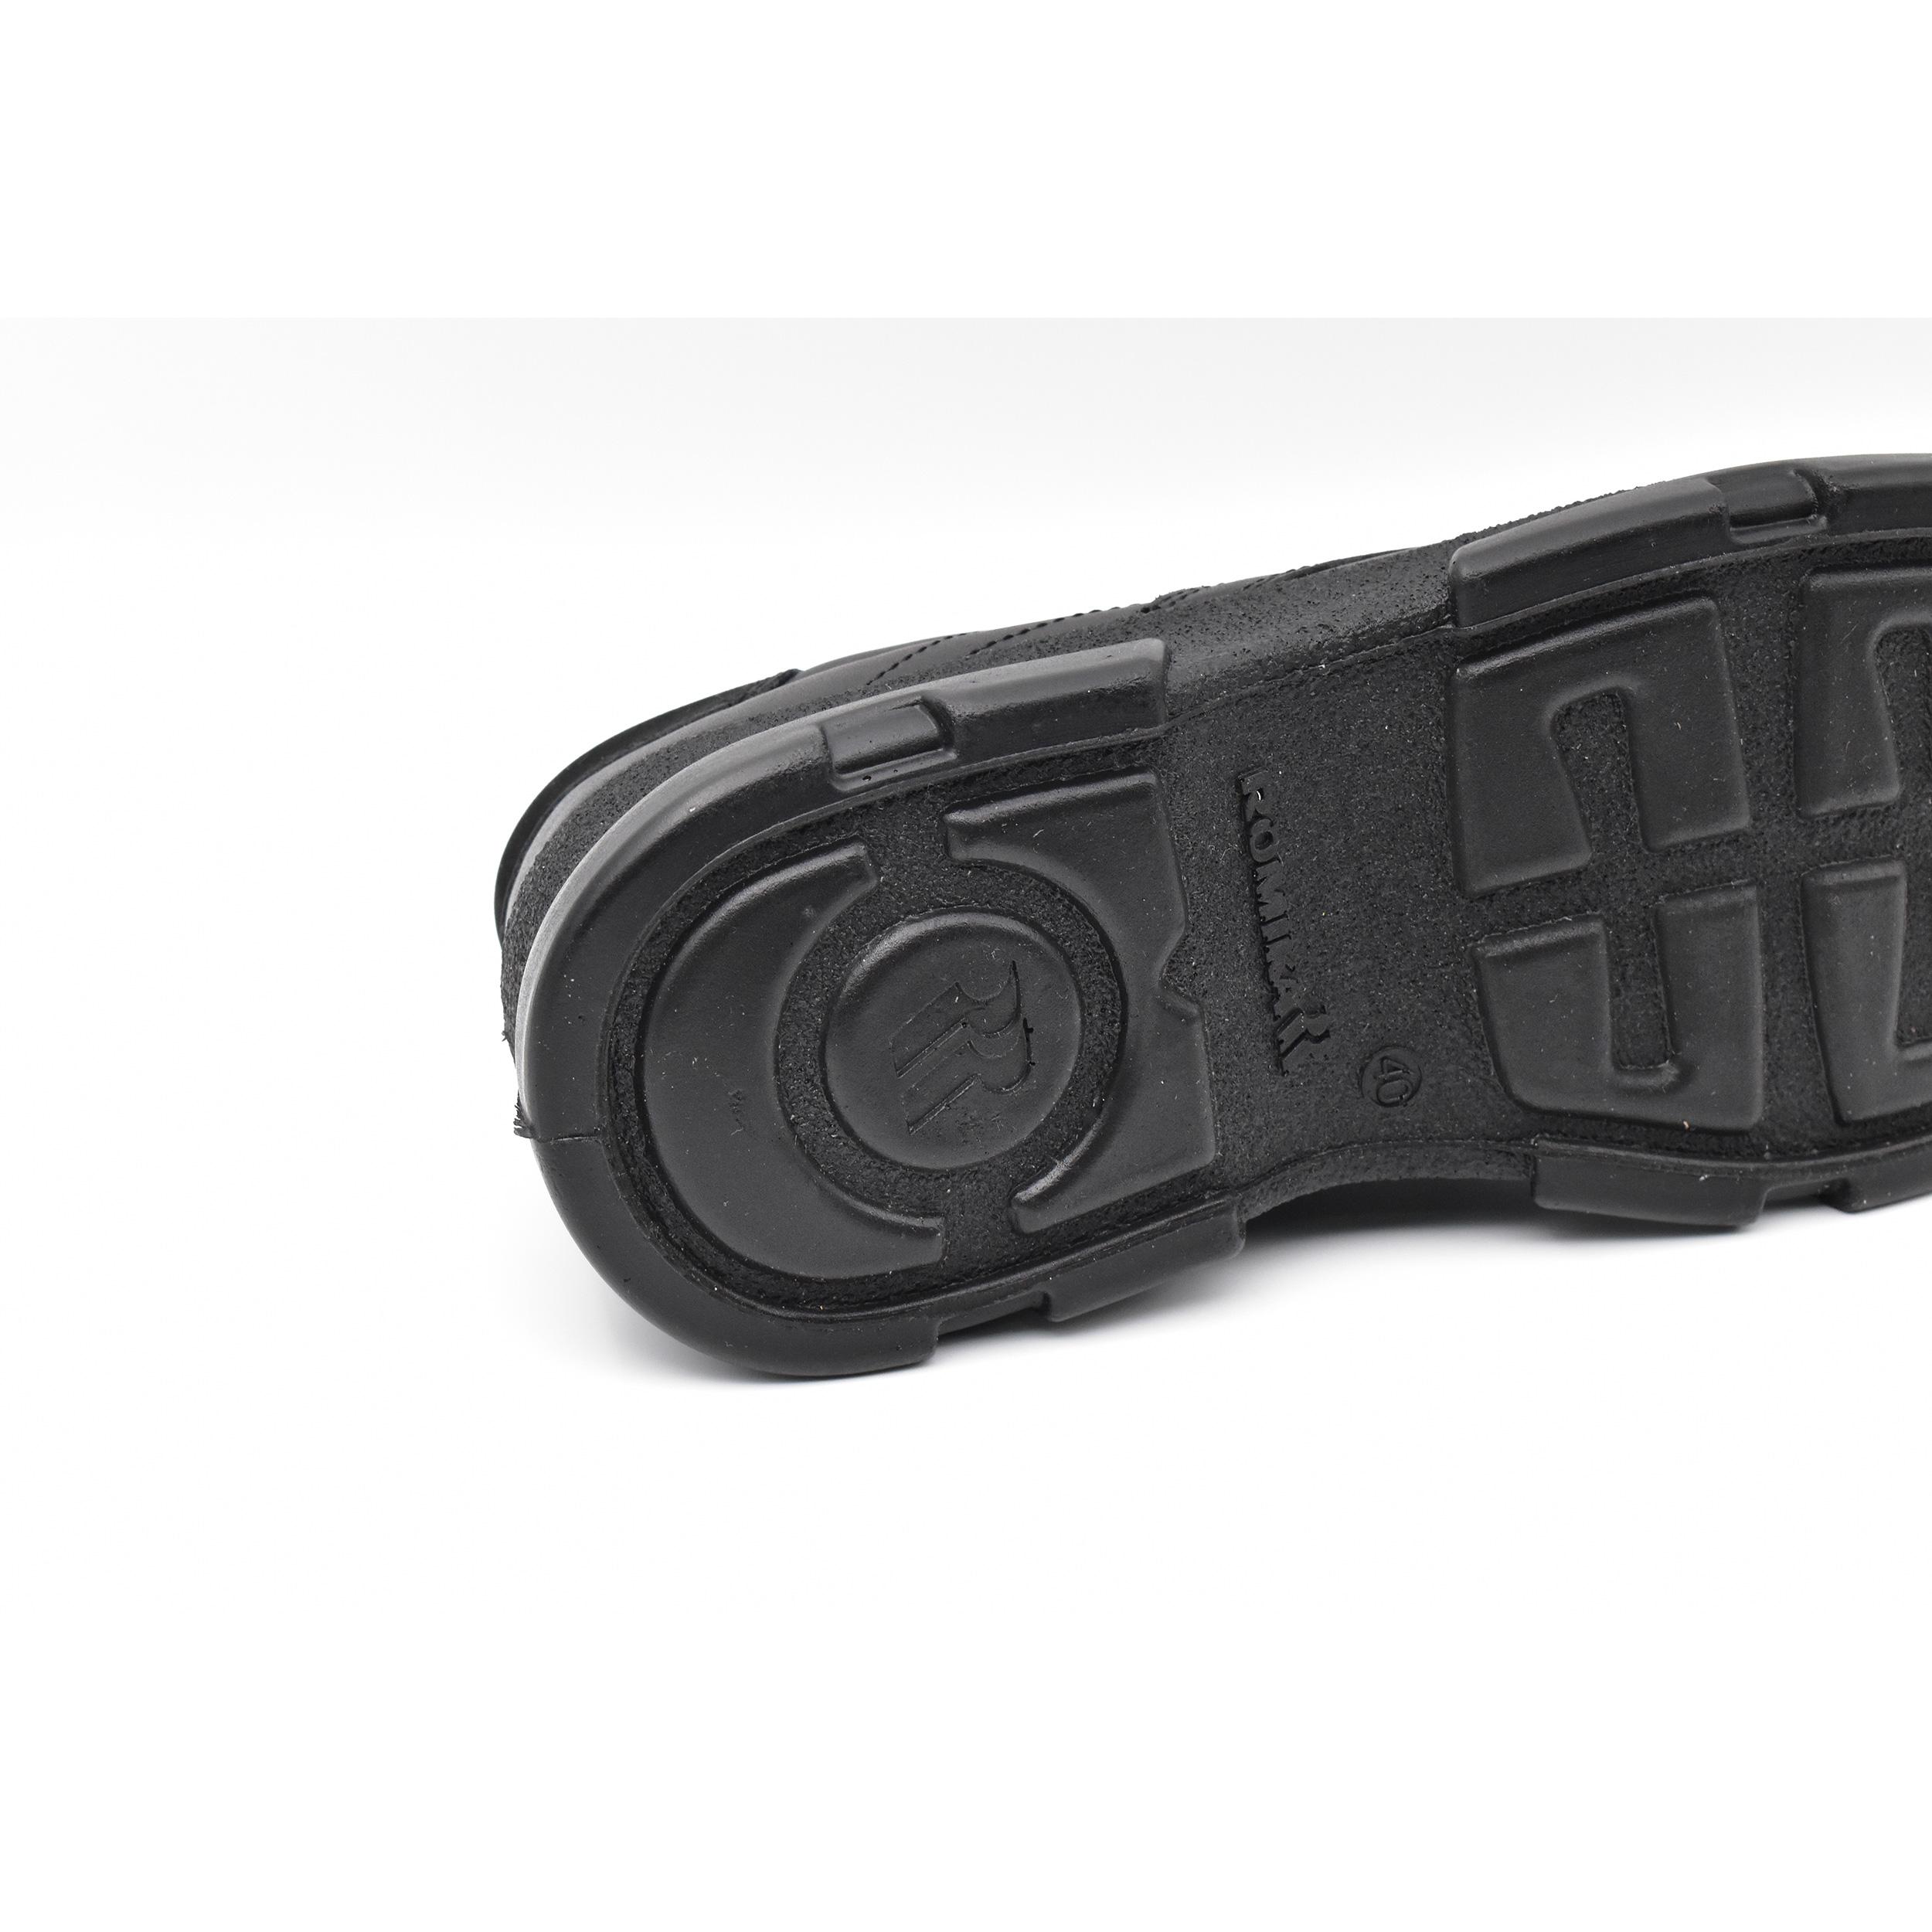 کفش روزمره مردانه البرز مدل تورنتو کد 7009 -  - 8